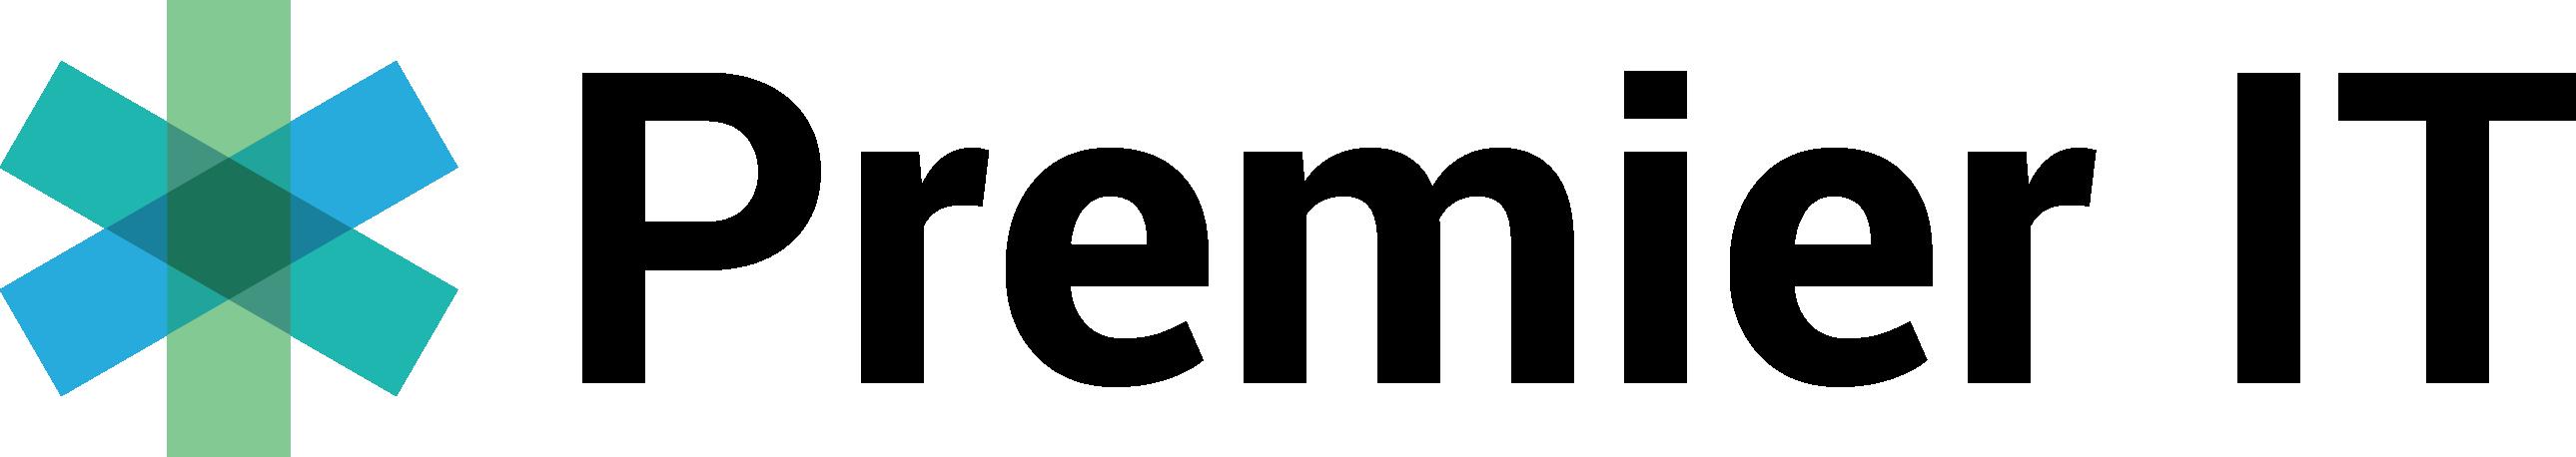 PremierIT black logo